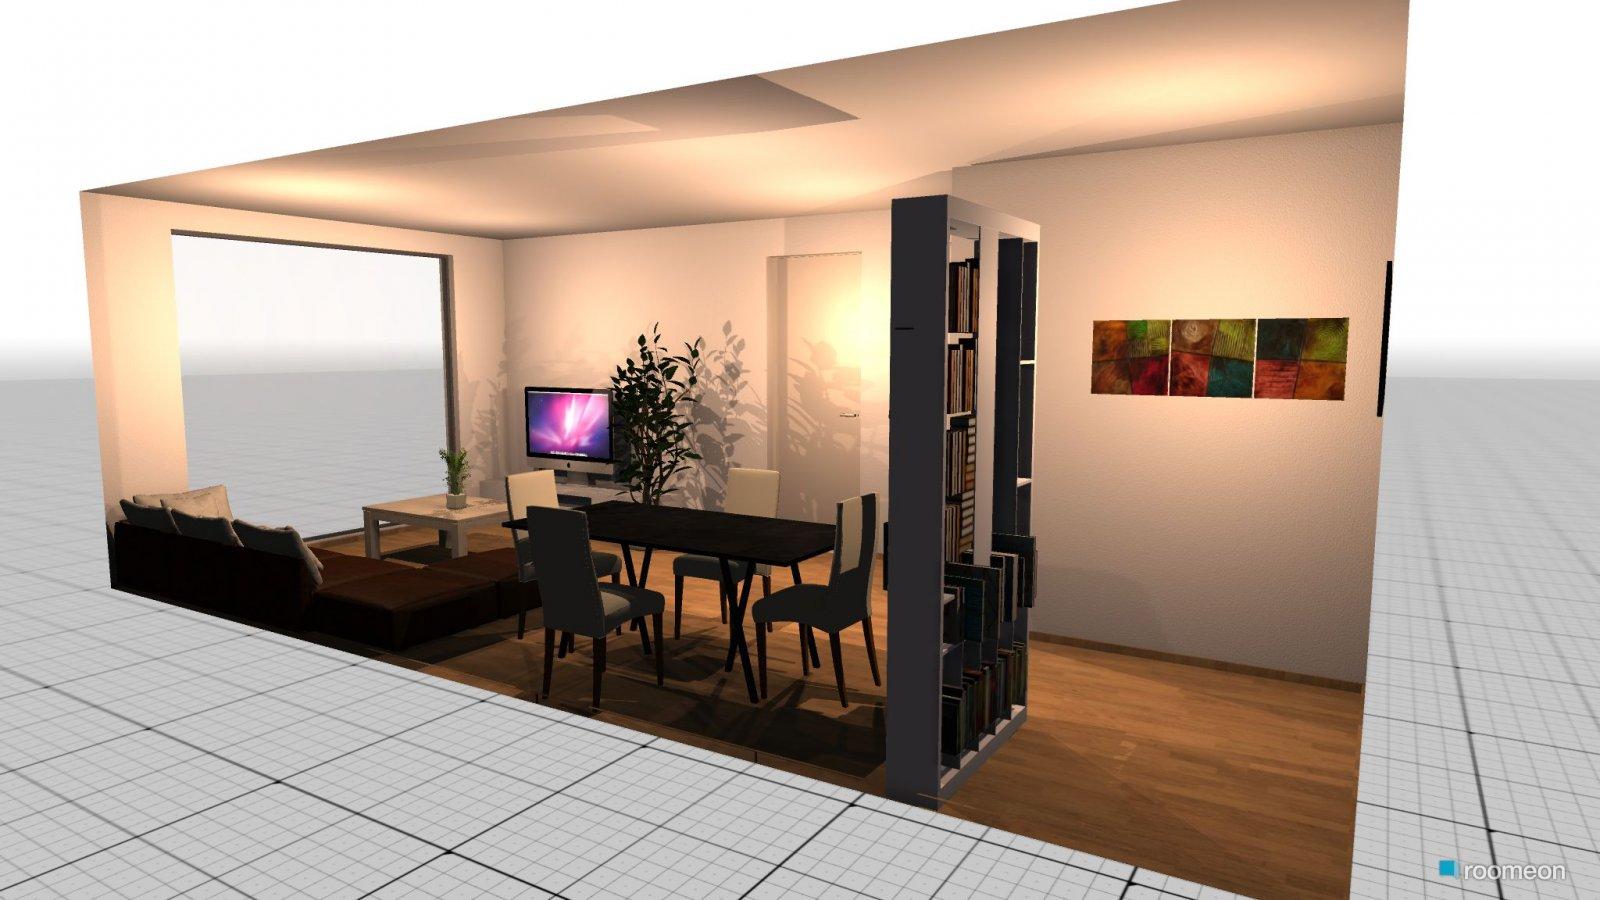 Raumplanung Salon comedor - roomeon Community